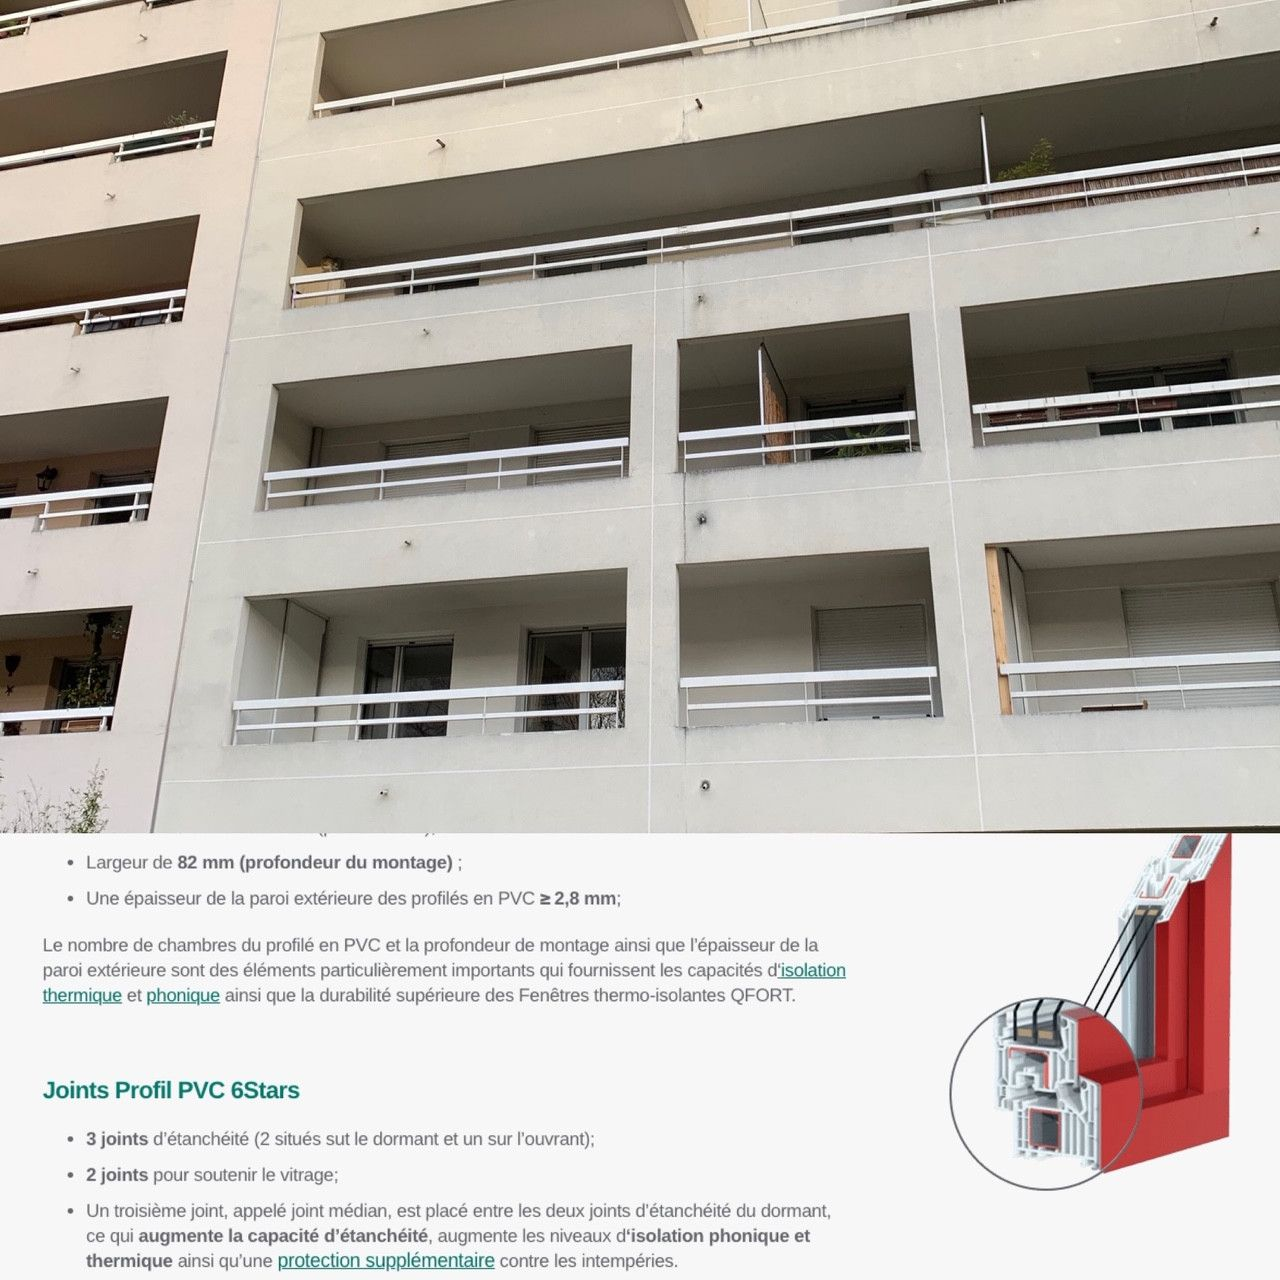 Changer Les Menuiseries Rue Du Dauphine 69003 Lyon Lyon Changer